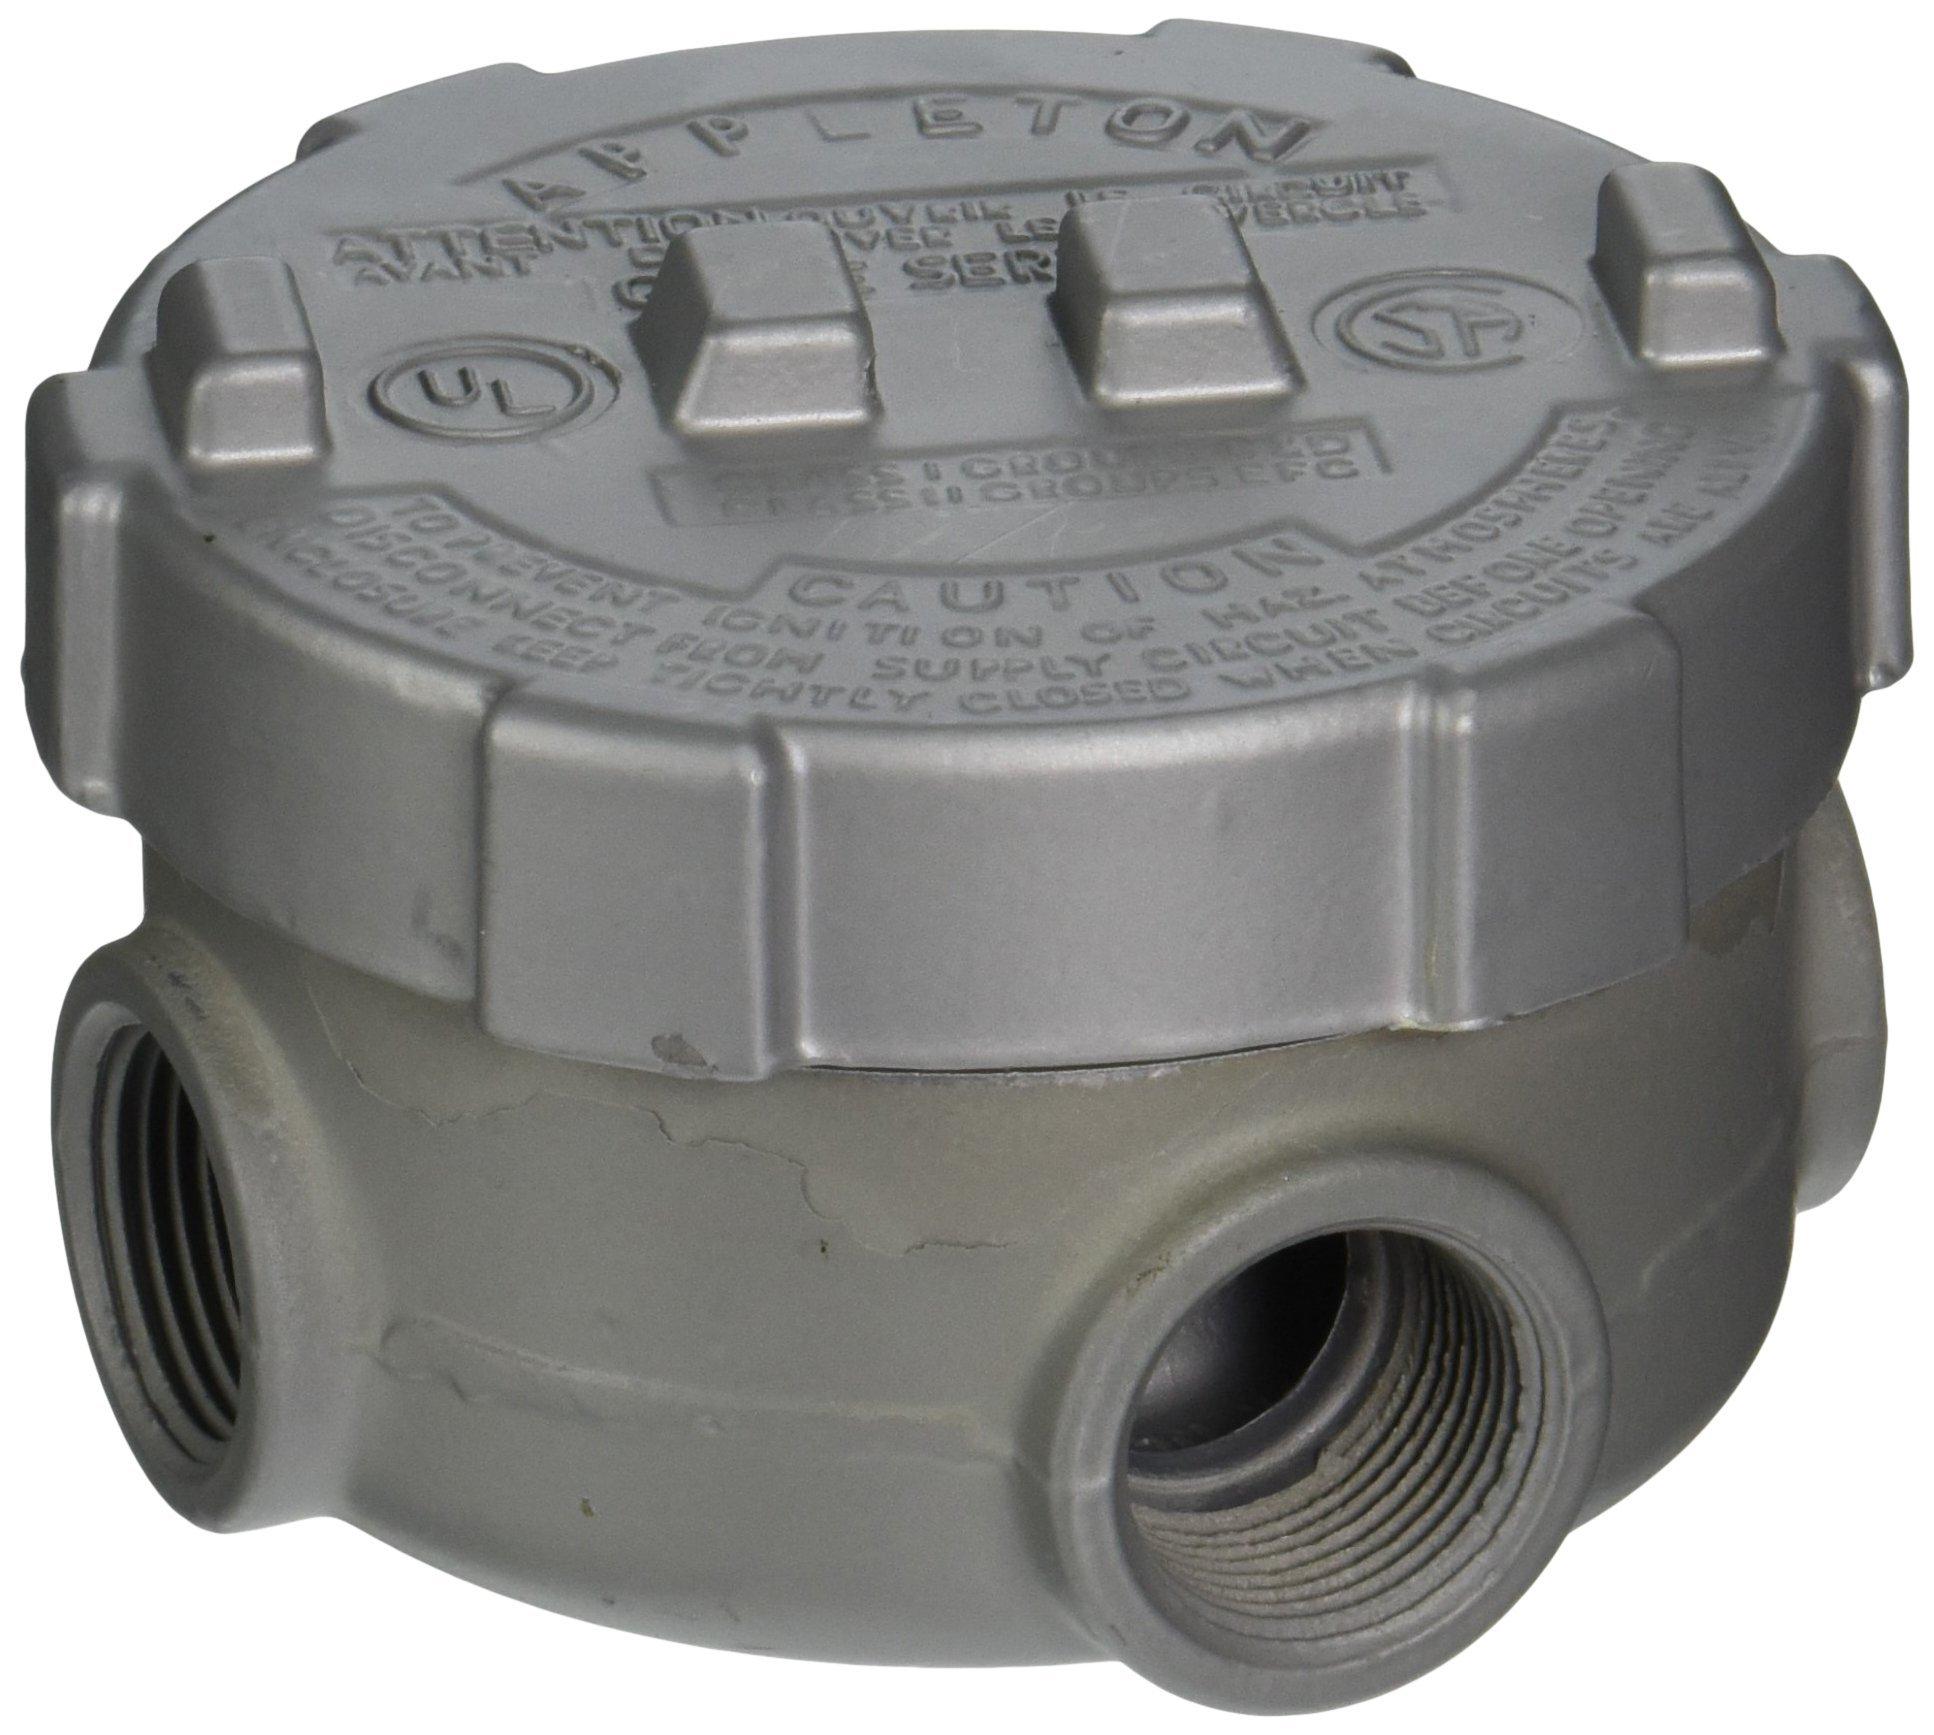 Appleton GRUE75-A Conduit Outlet Box, Aluminum, 3/4'' Hub